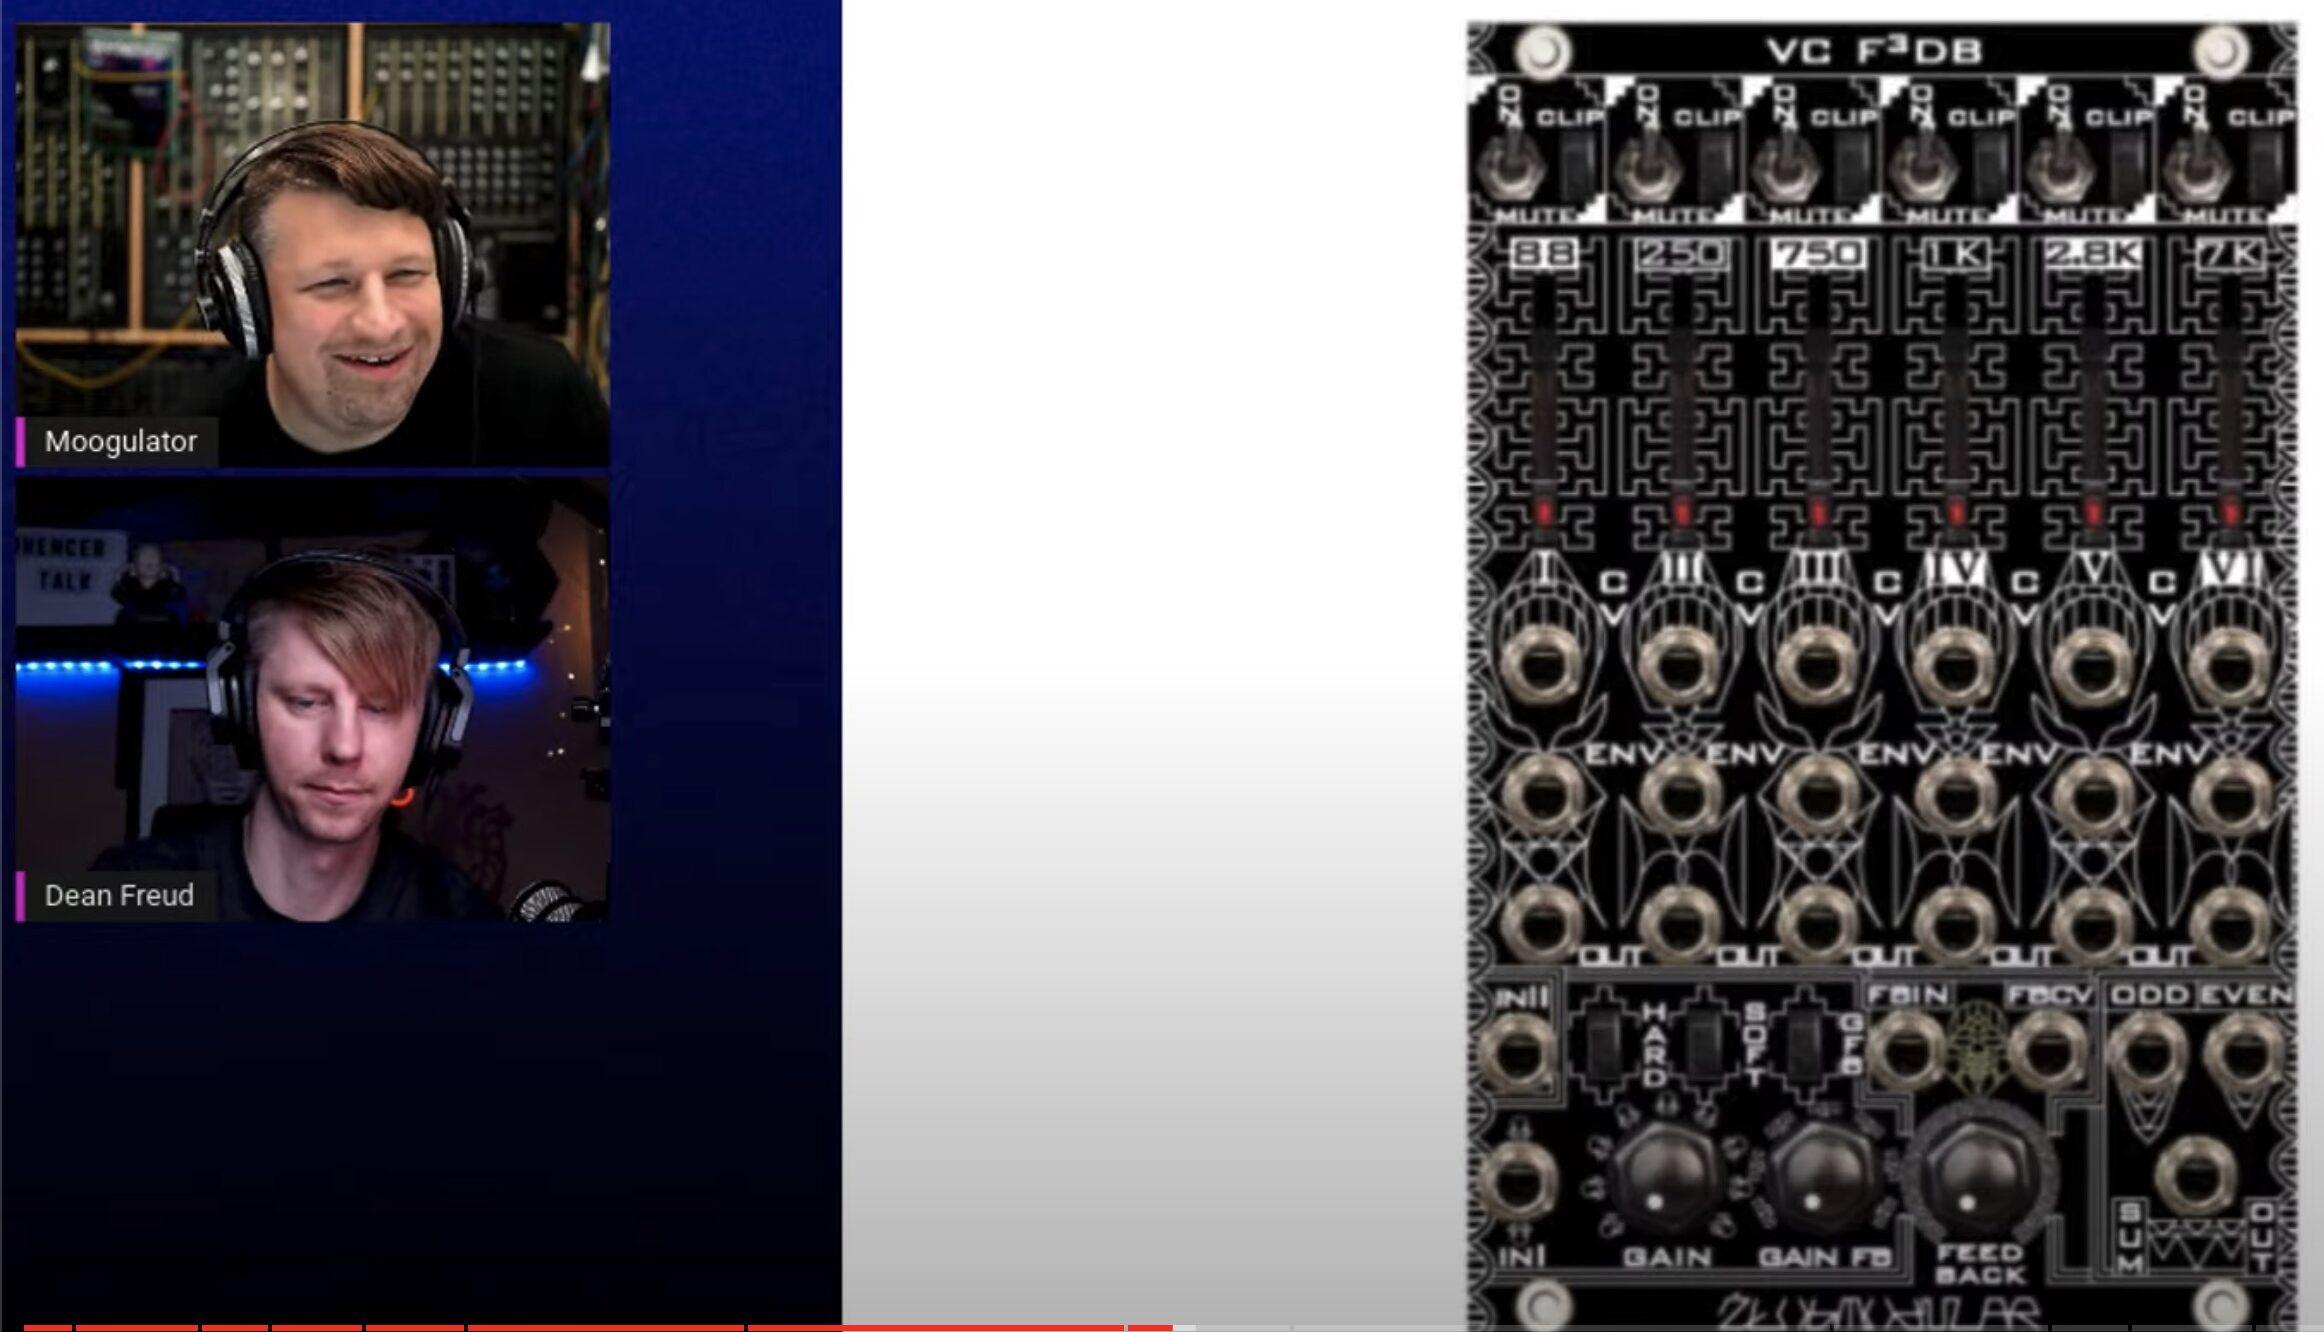 SequencerTalk 98 Synthesizer